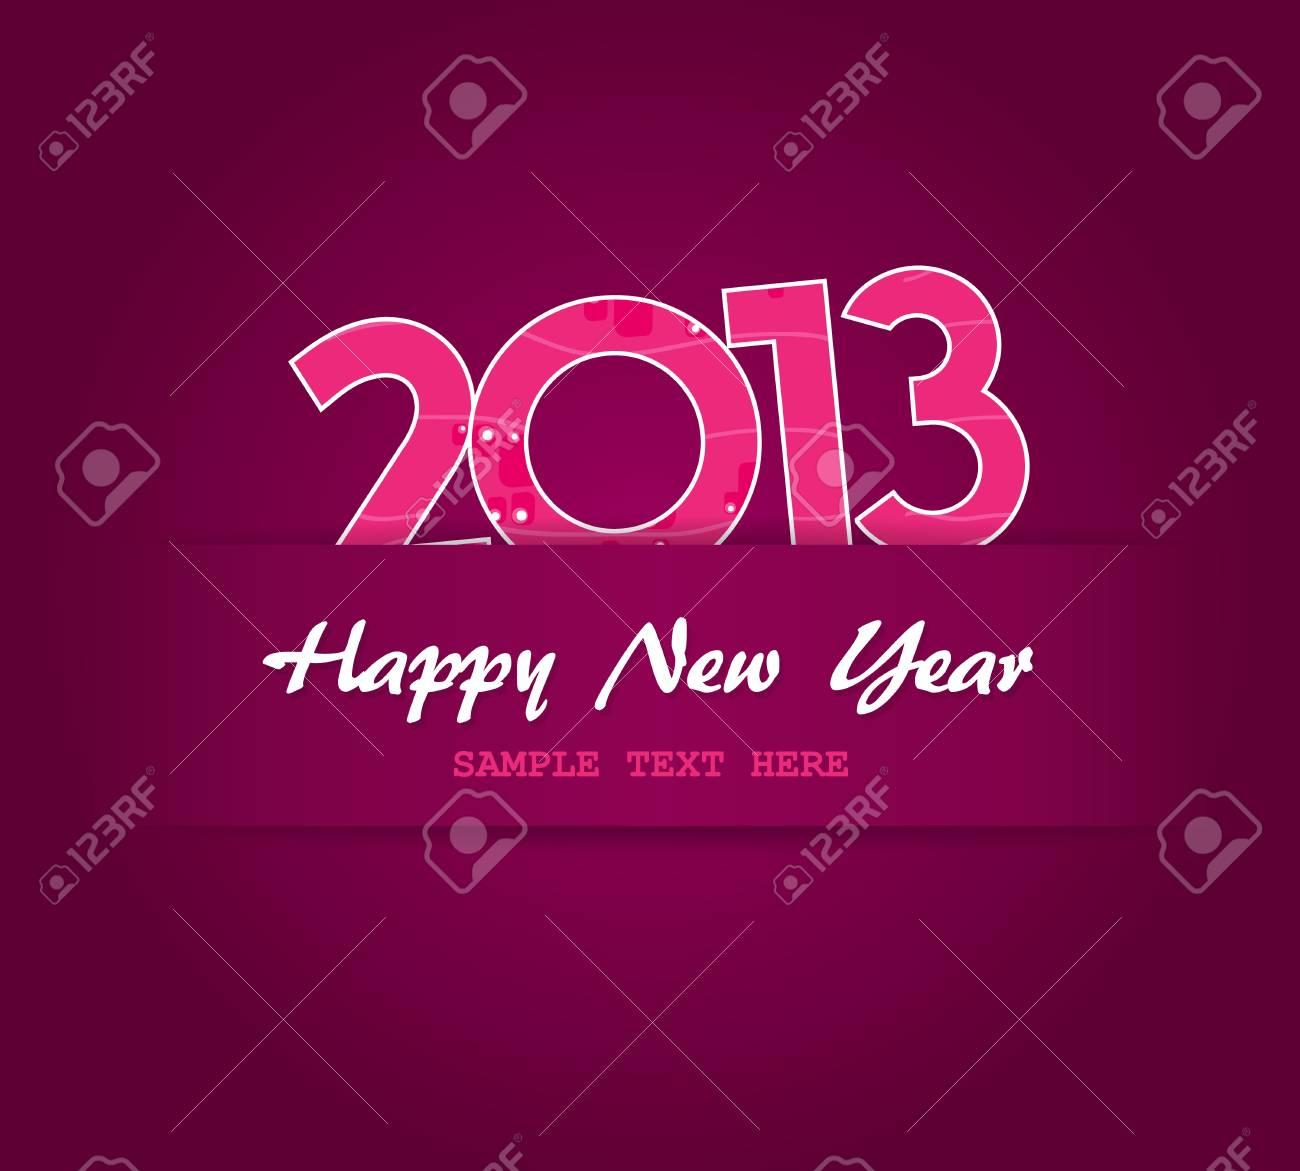 Happy New Year card. Stock Vector - 17679949